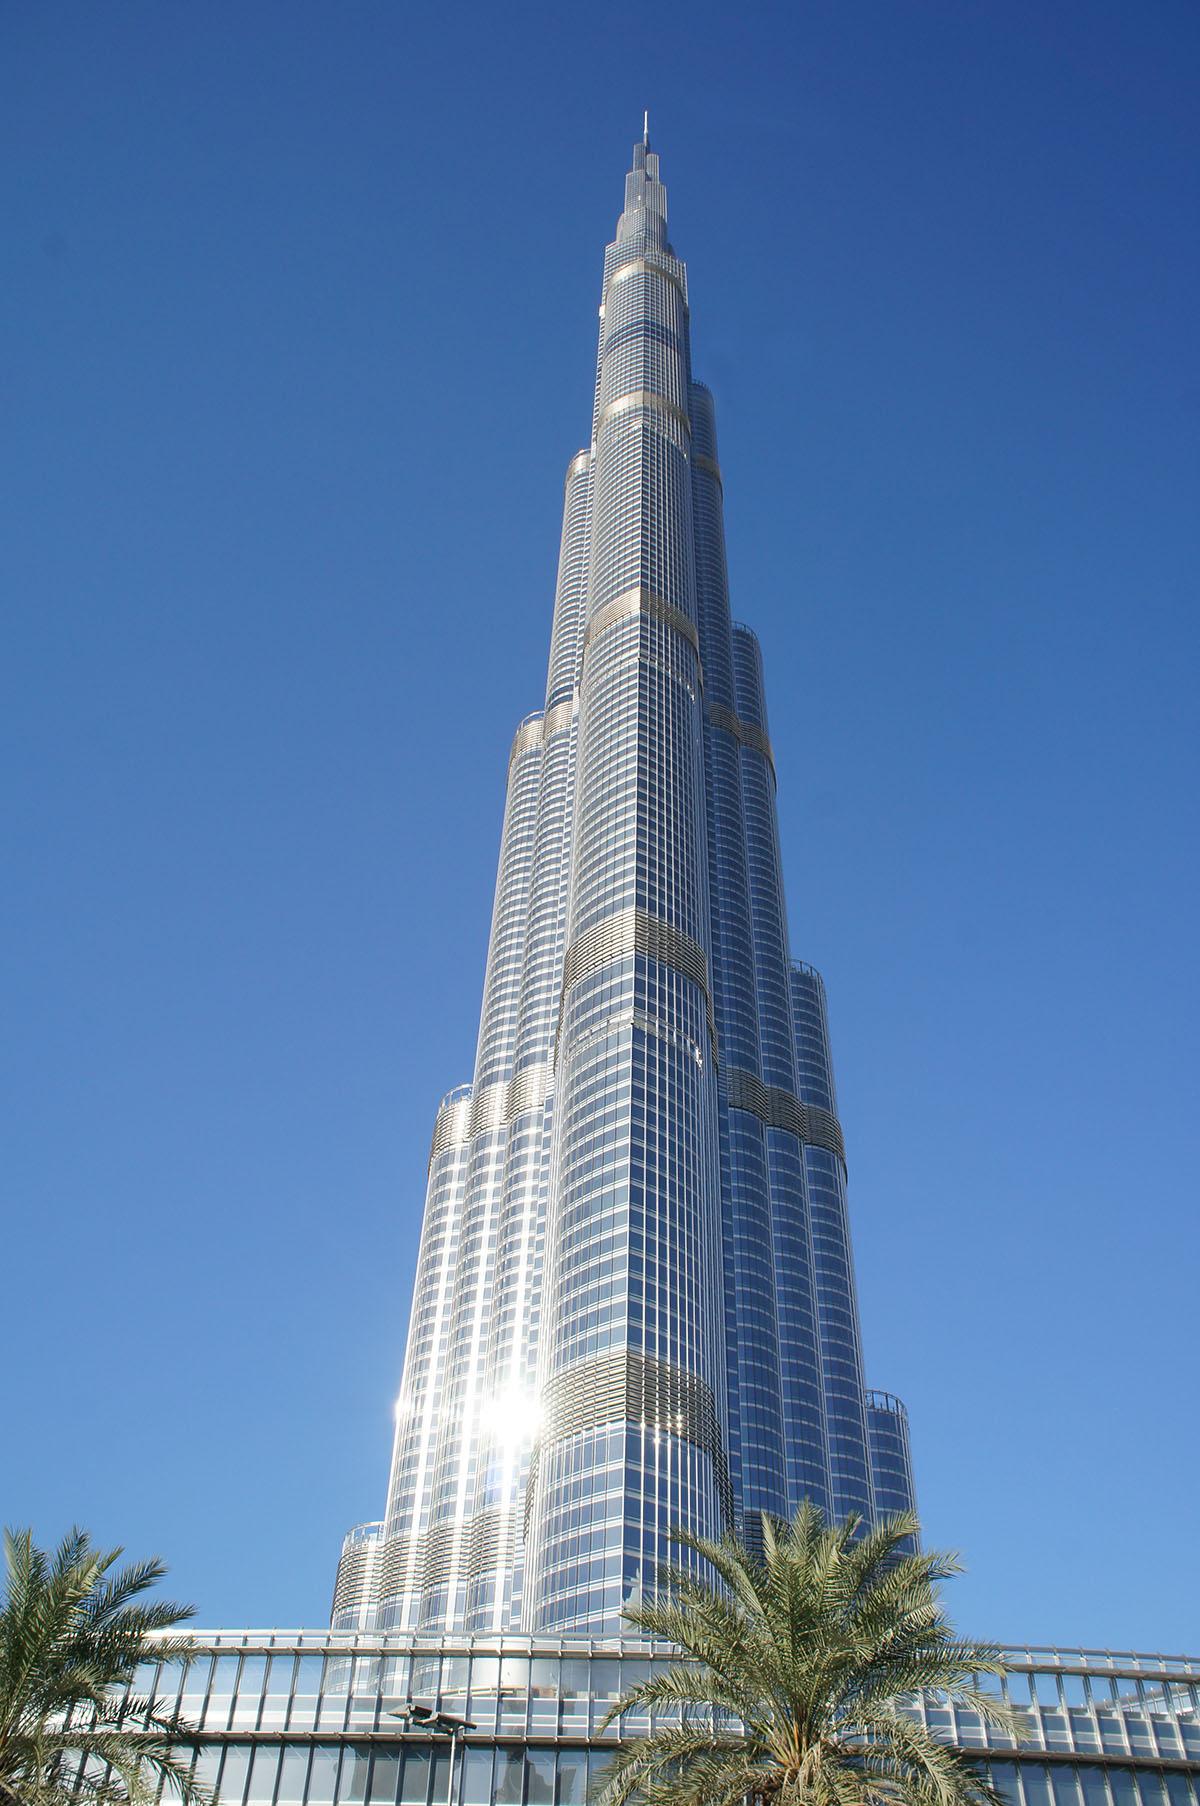 Top Image Of Burj Khalifa Dubai | Decor & Design Ideas in HD